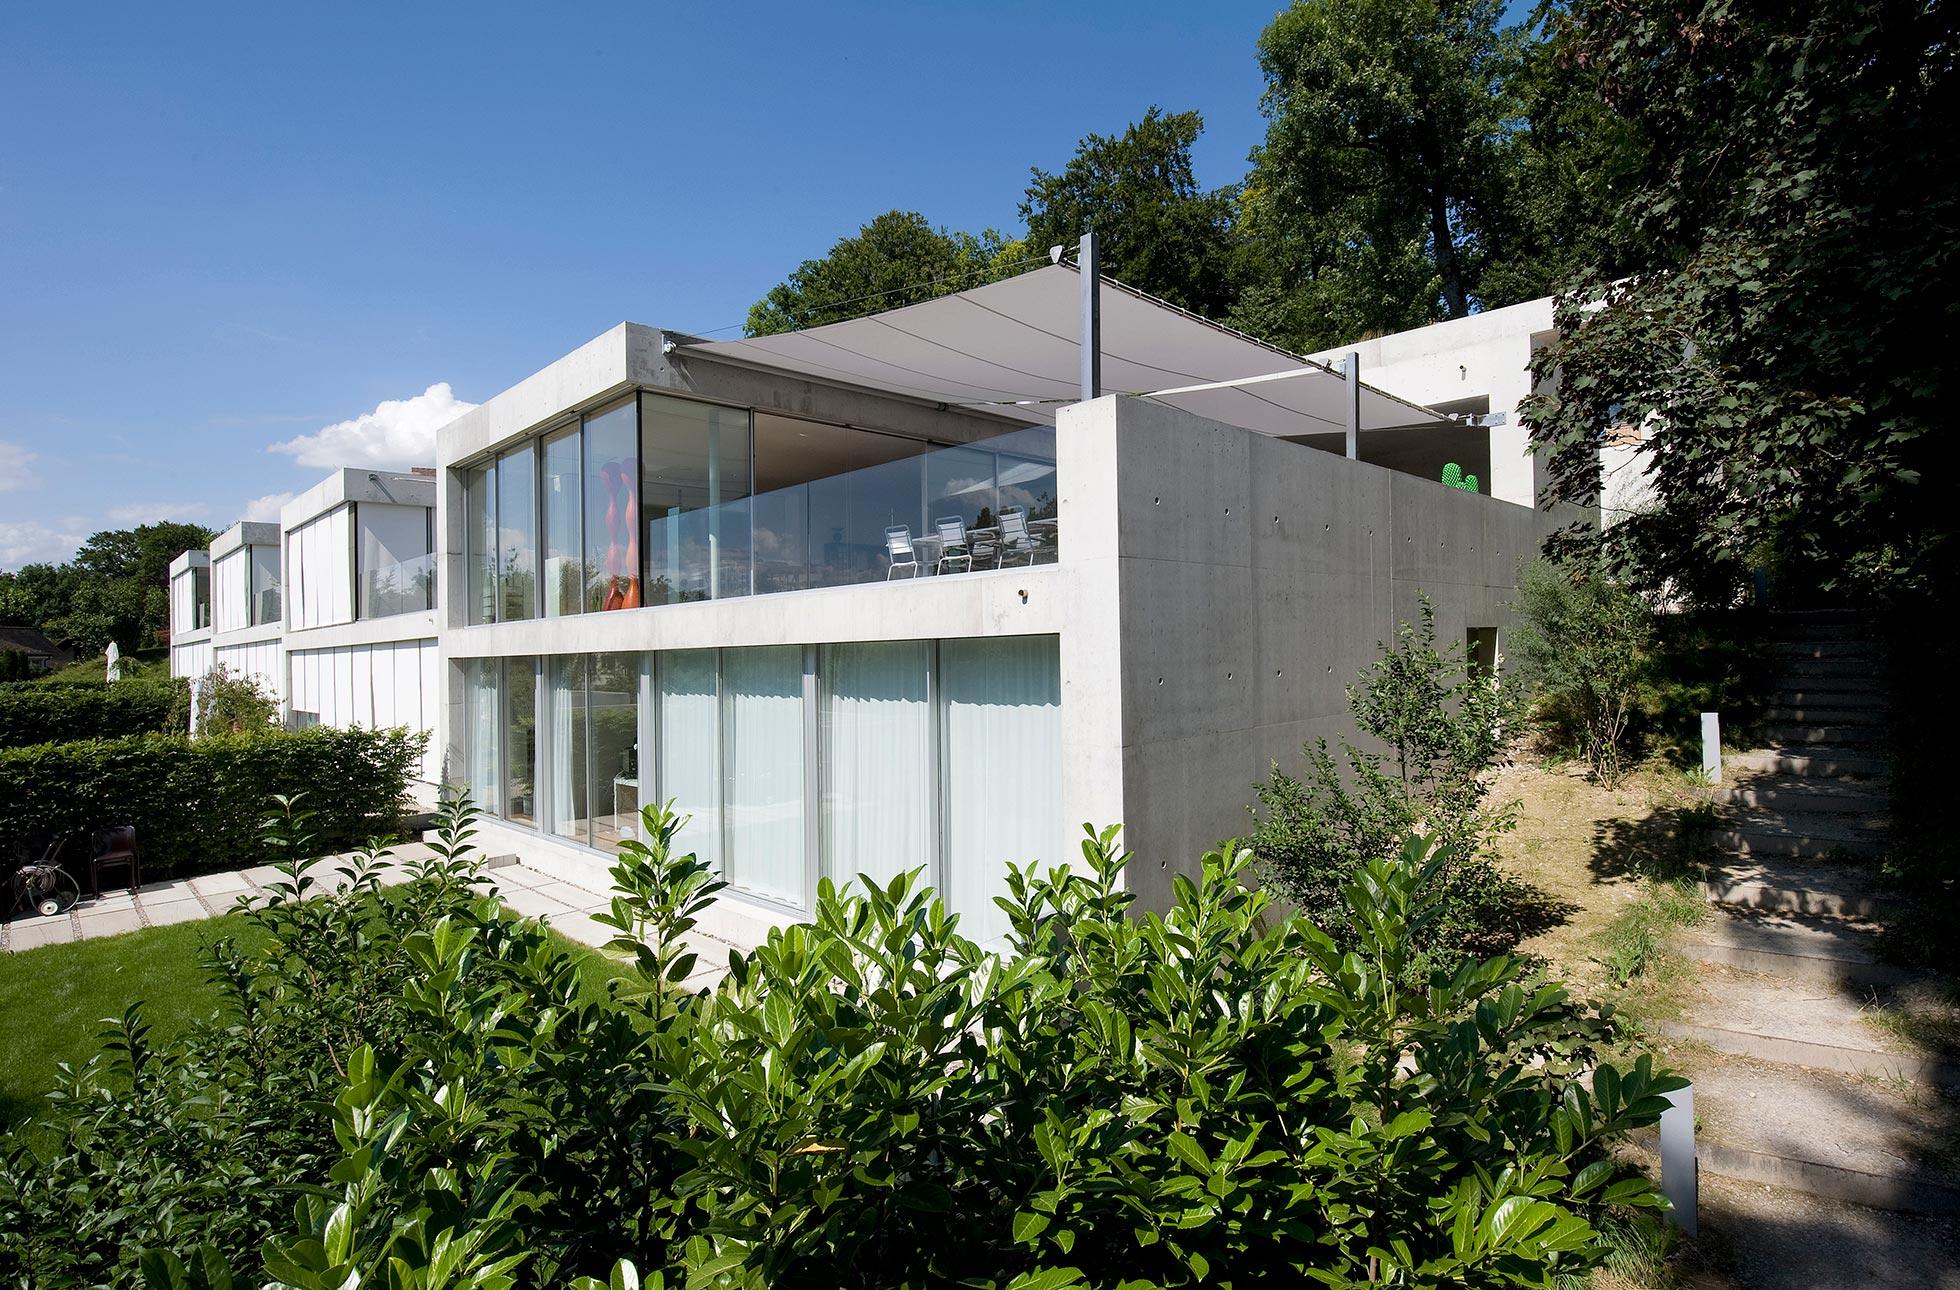 Sonnenschutz Siedlung Winterthur